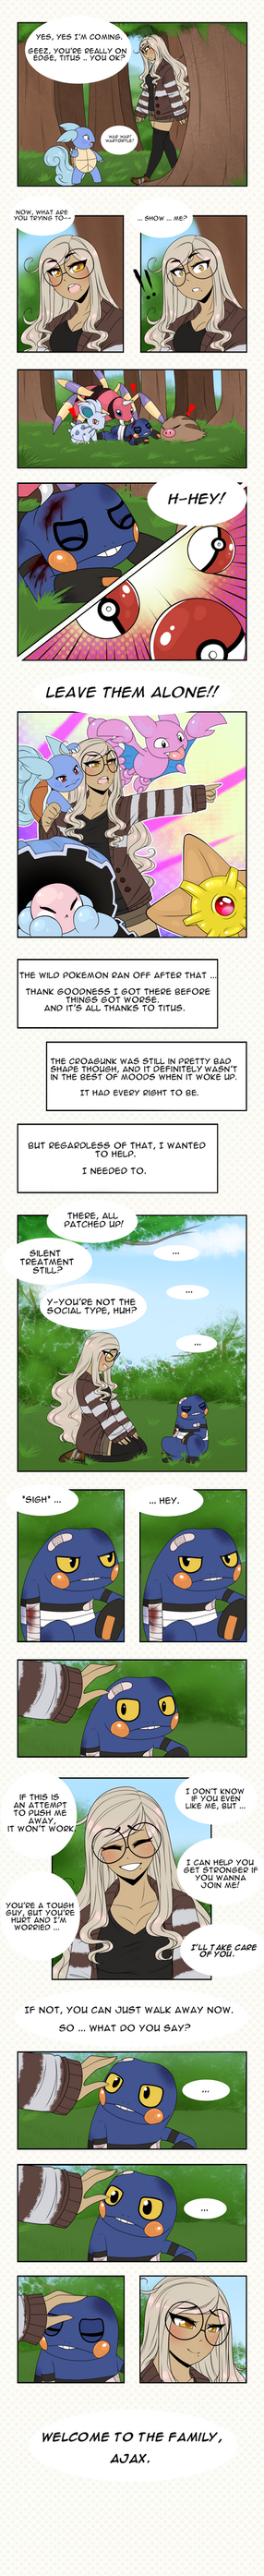 :PokemonTownship: Catching Croagunk by iLiekSkittlez